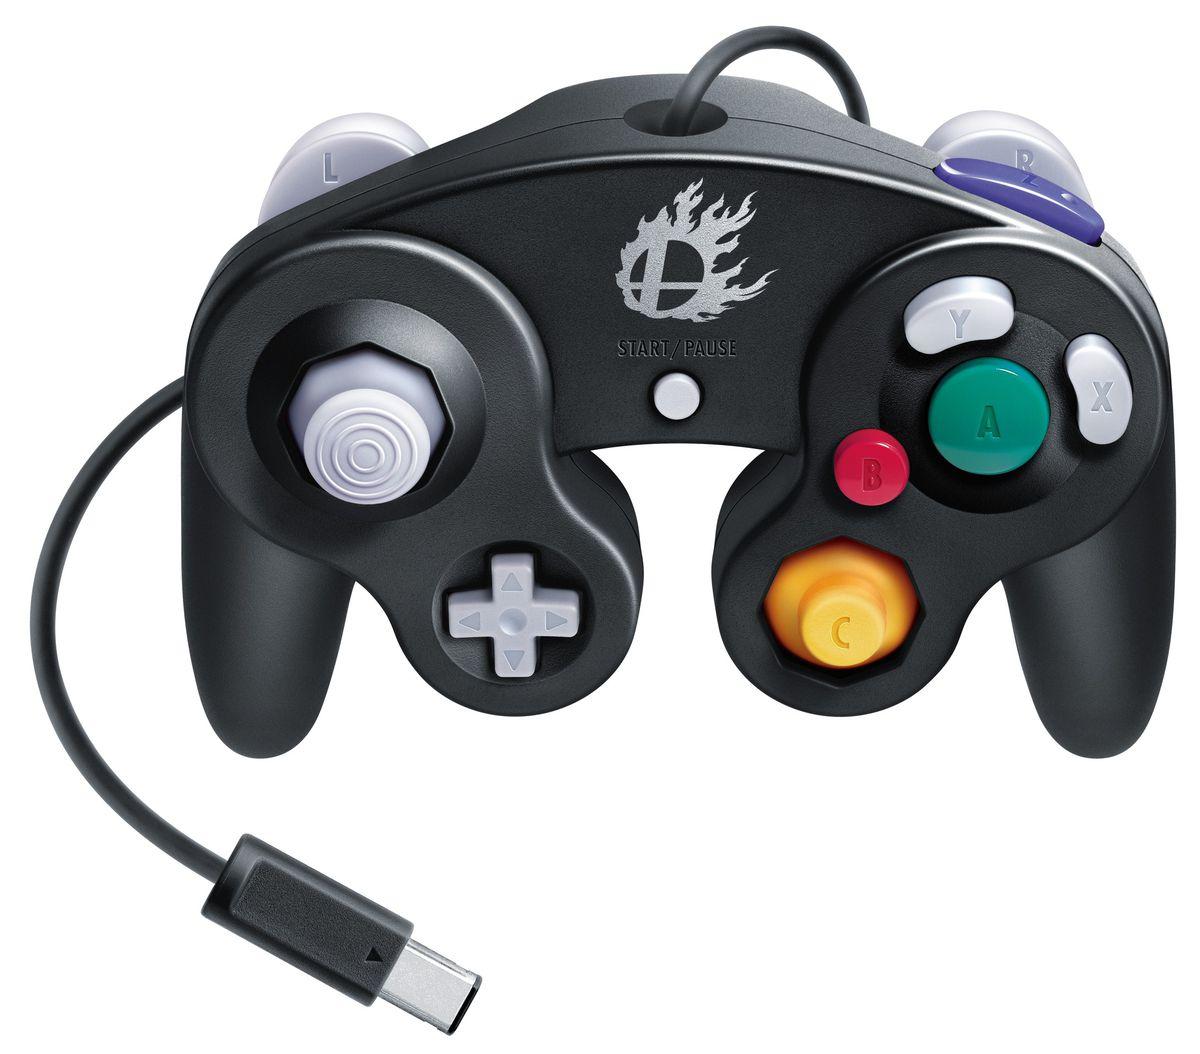 ... Gamecube Controller Smash Bros Edition (Wii U)